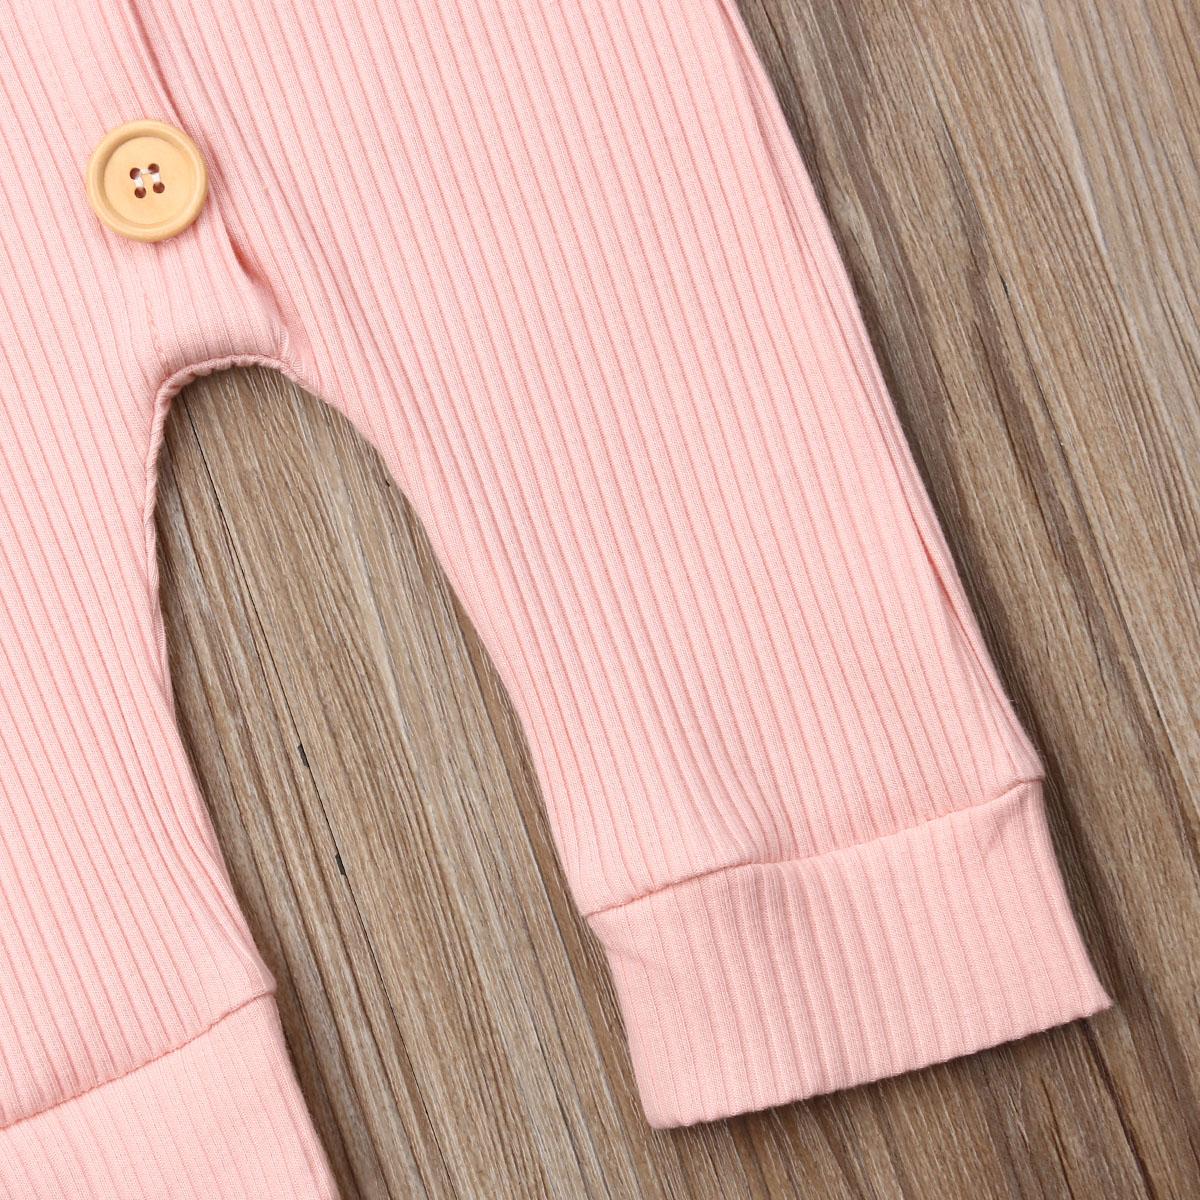 Hfab88915c9954762a9b0eba795d8a812K Spring Fall Newborn Baby Girl Boy Clothes Long Sleeve Knitted Romper + Headband Jumpsuit 2PCS Outfit 0-24M